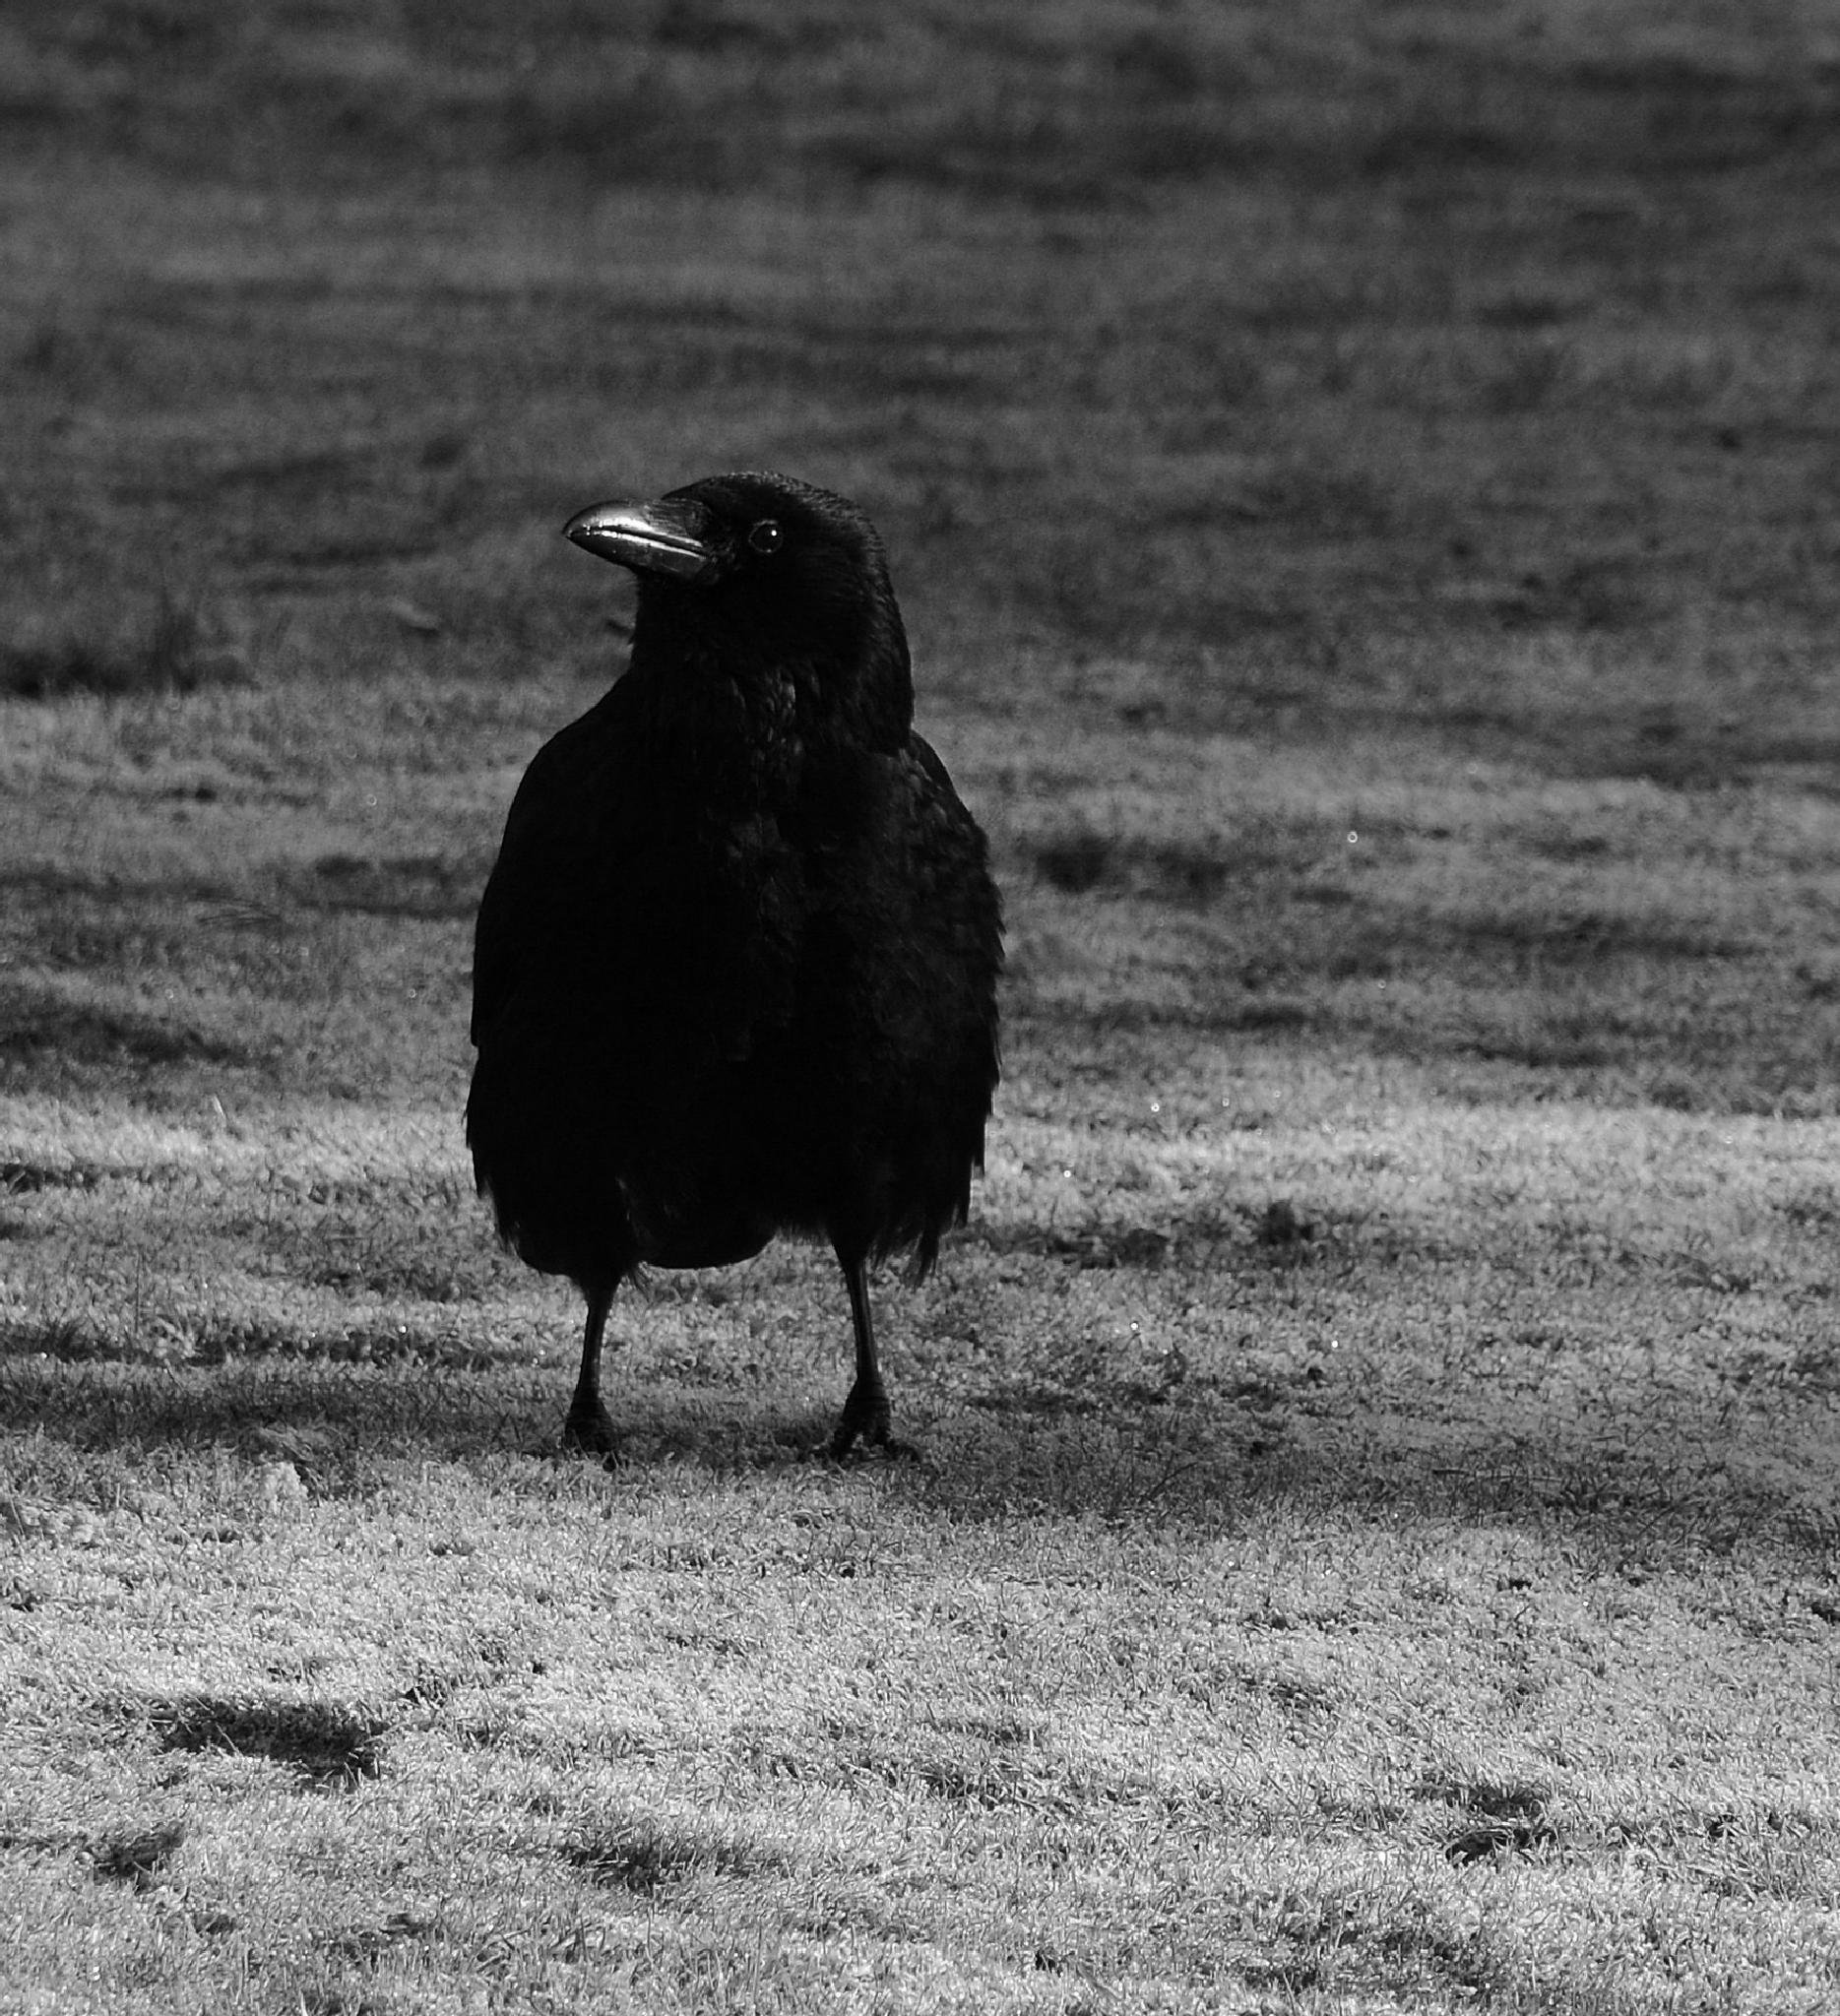 The Crow by martinfairbairn178